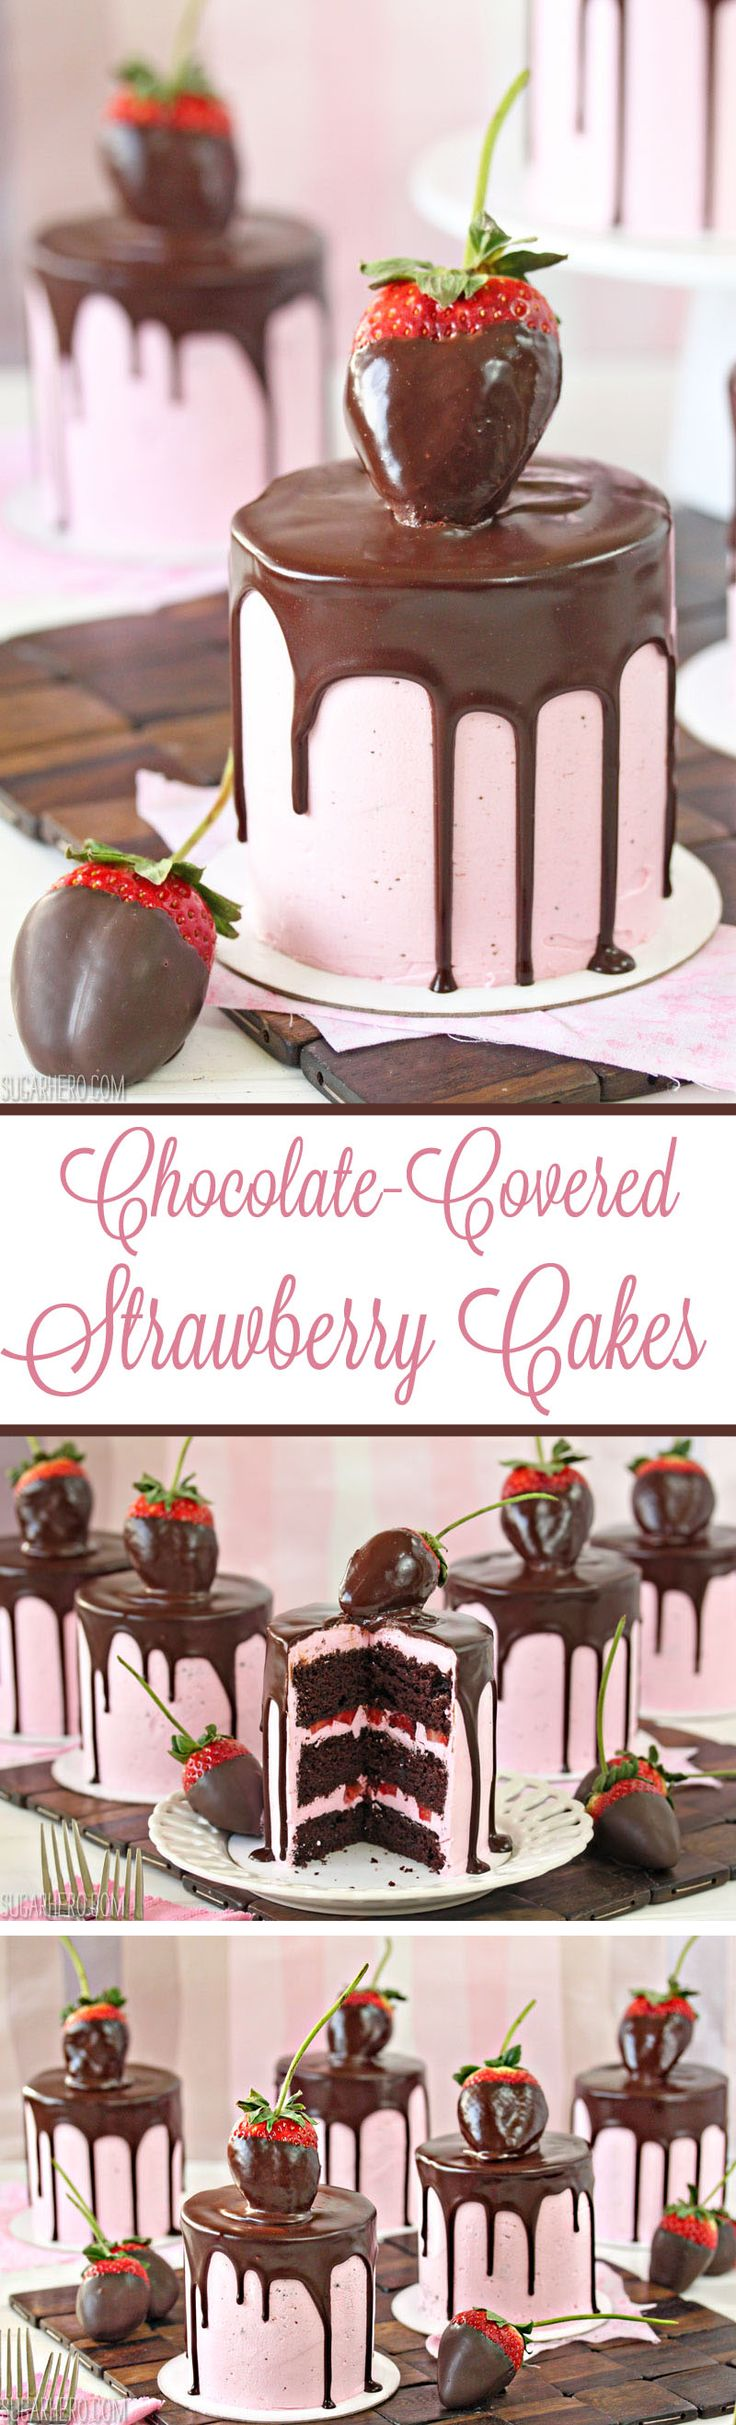 Chocolate-Covered Strawberry Mini Cakes | From SugarHero.com